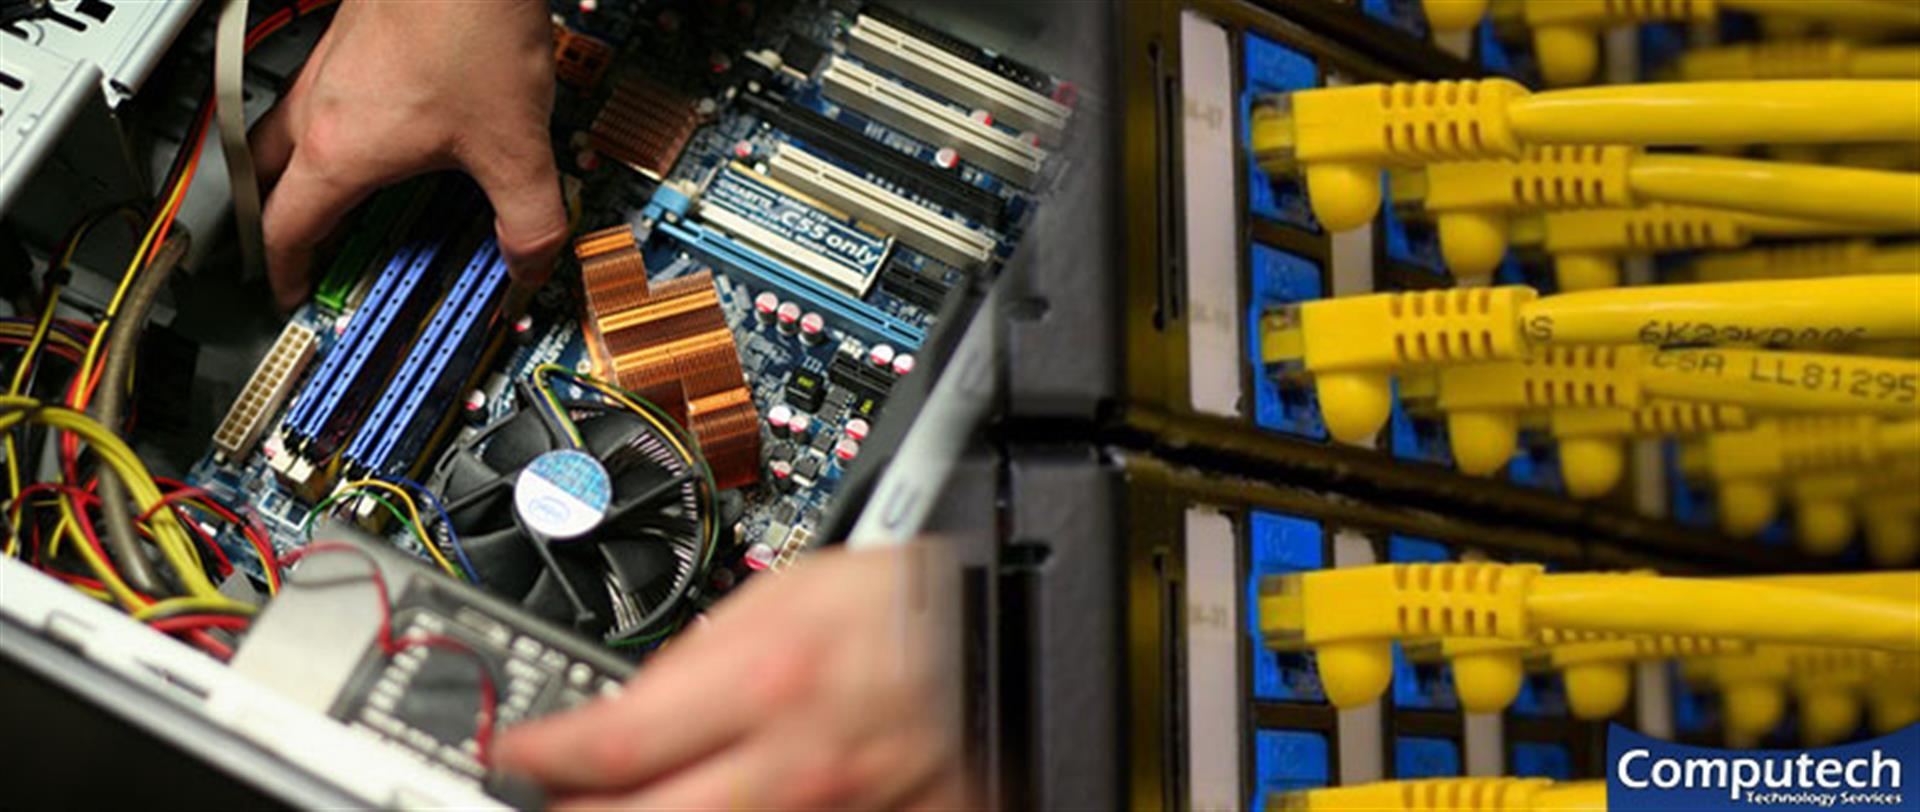 Adairsville Georgia On Site PC & Printer Repair, Network, Voice & Data Cabling Services